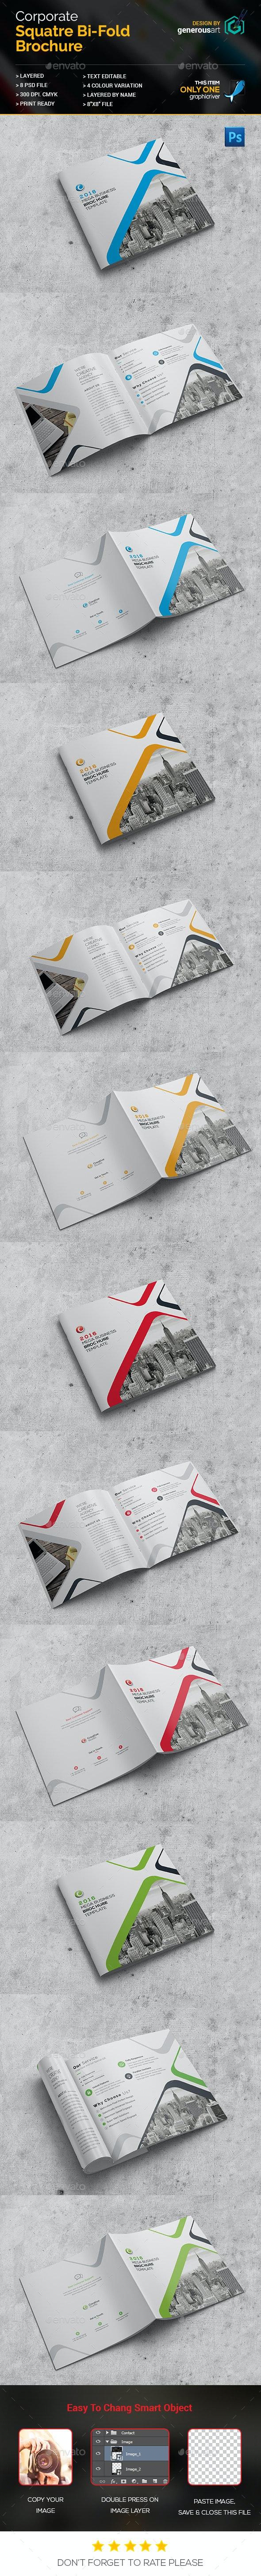 Pro Square Bi-Fold Brochure - Corporate Brochures